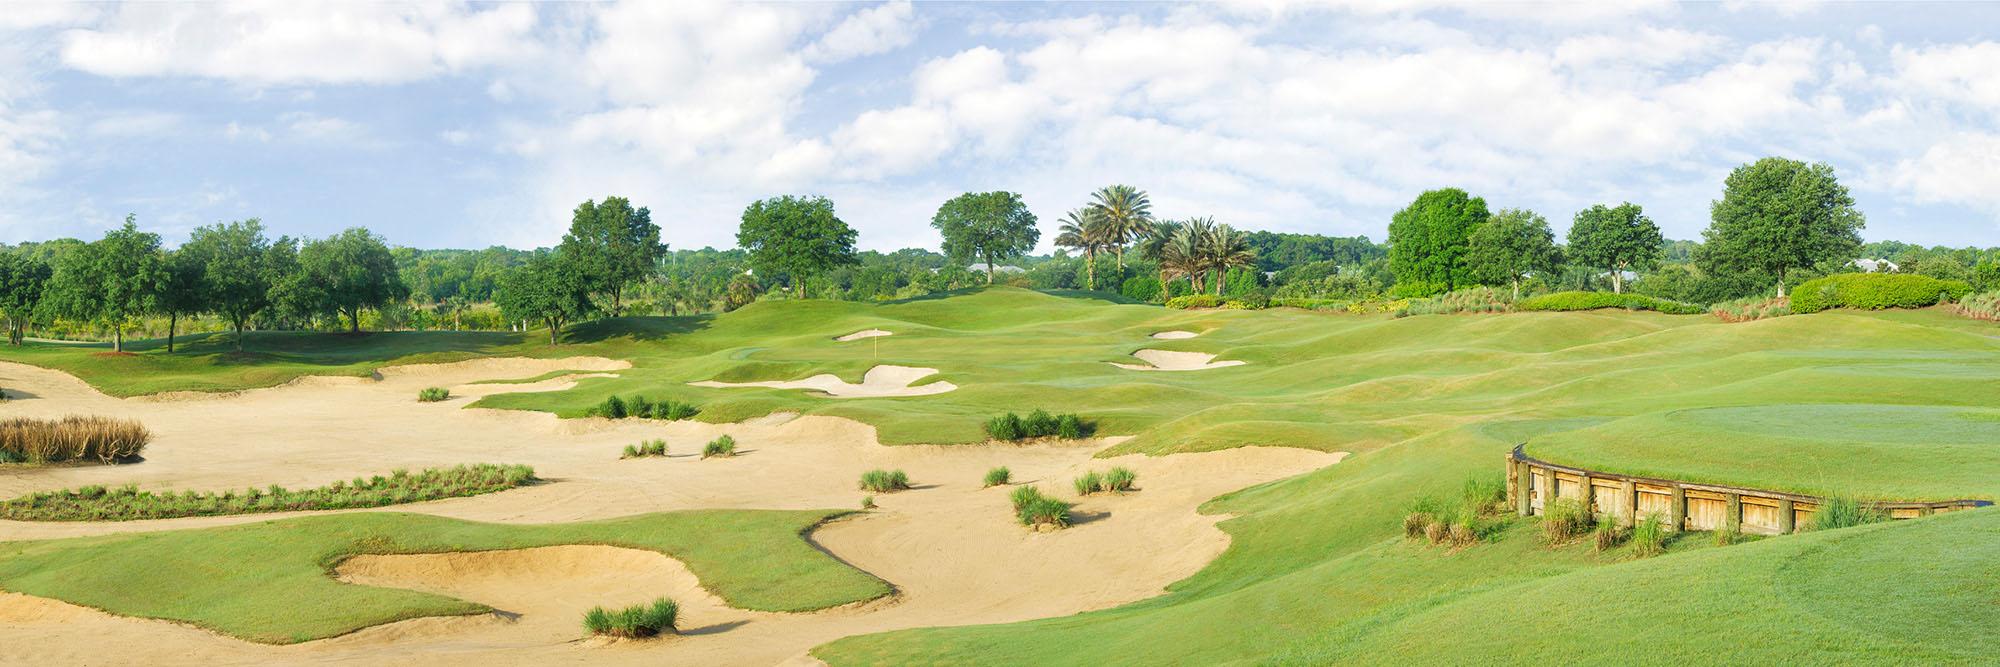 Golf Course Image - Reunion Resort Watson No. 12